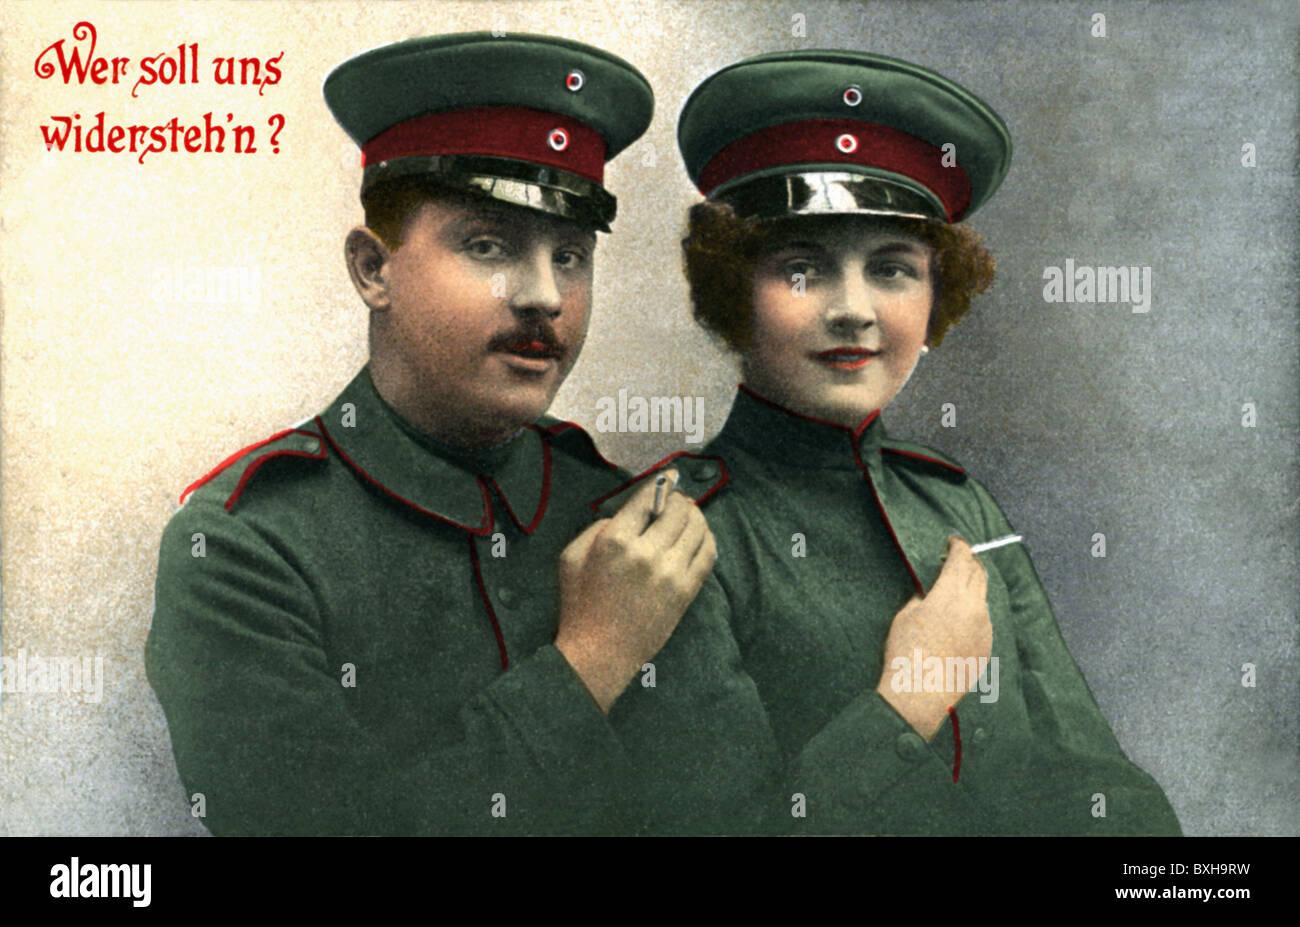 first world war /WWI/, world wars, 1st, couple in green uniform